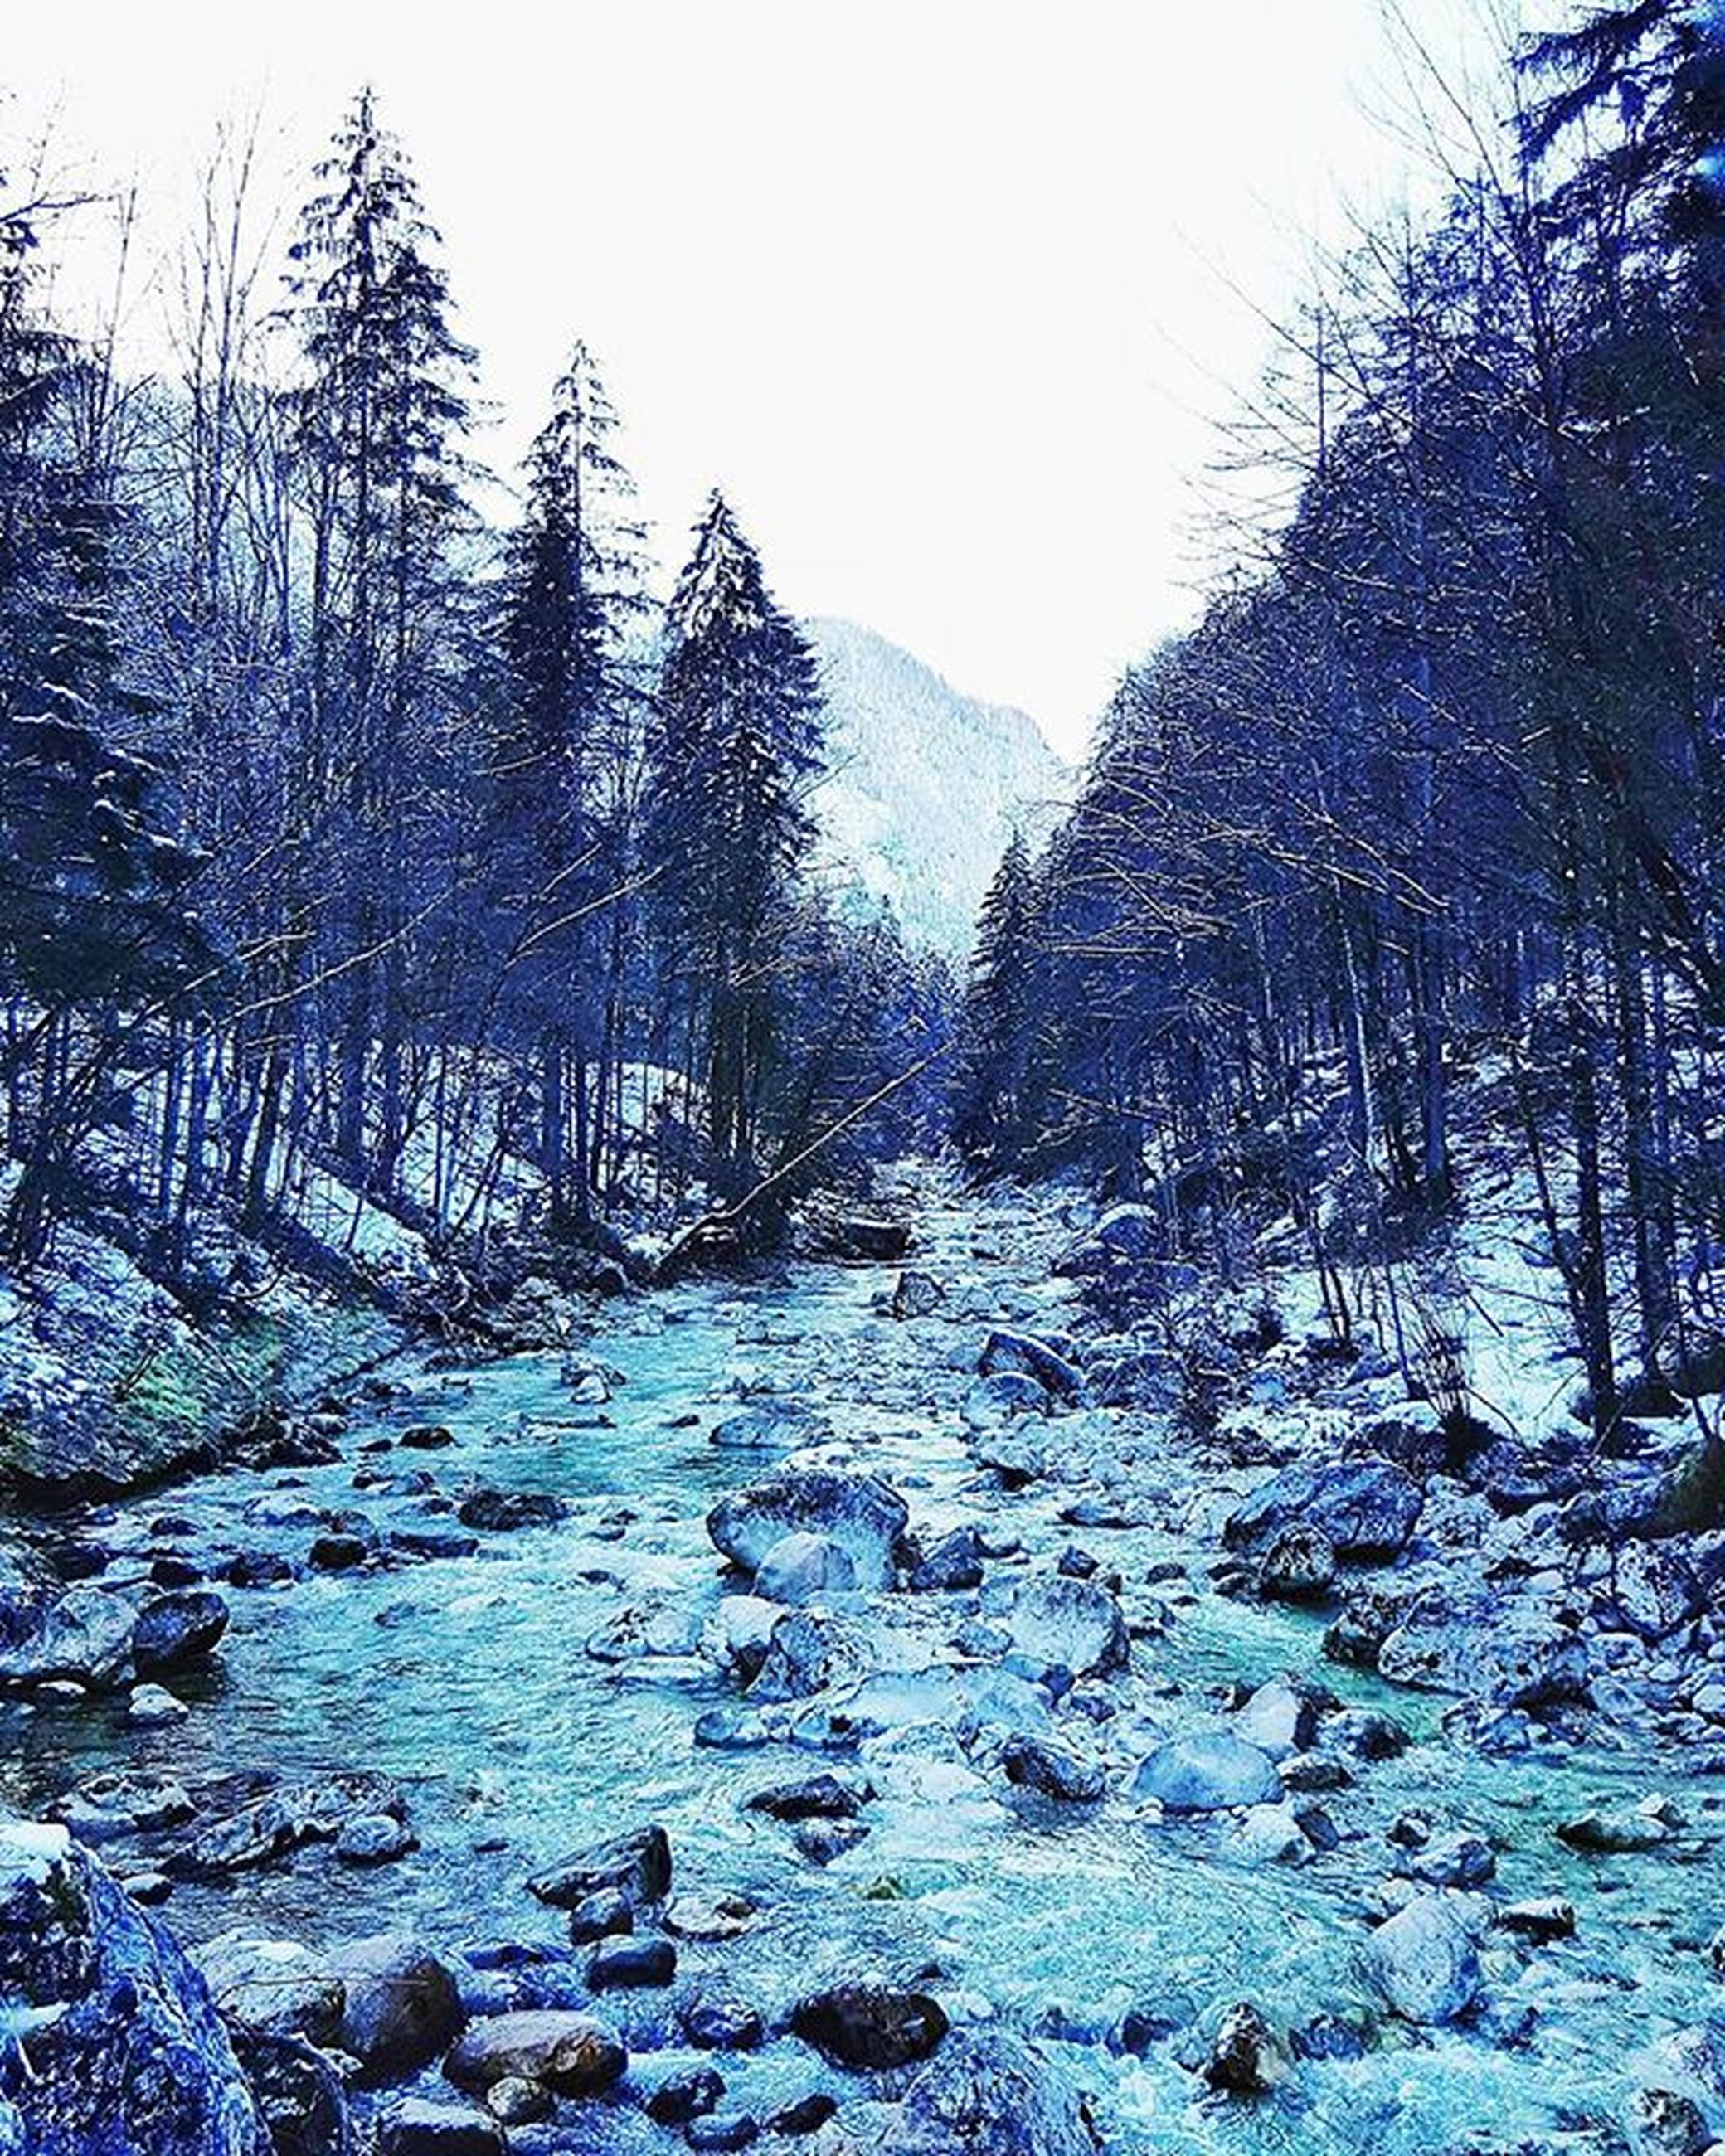 water, tranquil scene, tranquility, scenics, beauty in nature, tree, clear sky, nature, bare tree, lake, winter, non-urban scene, river, landscape, snow, rock - object, cold temperature, idyllic, sky, stream